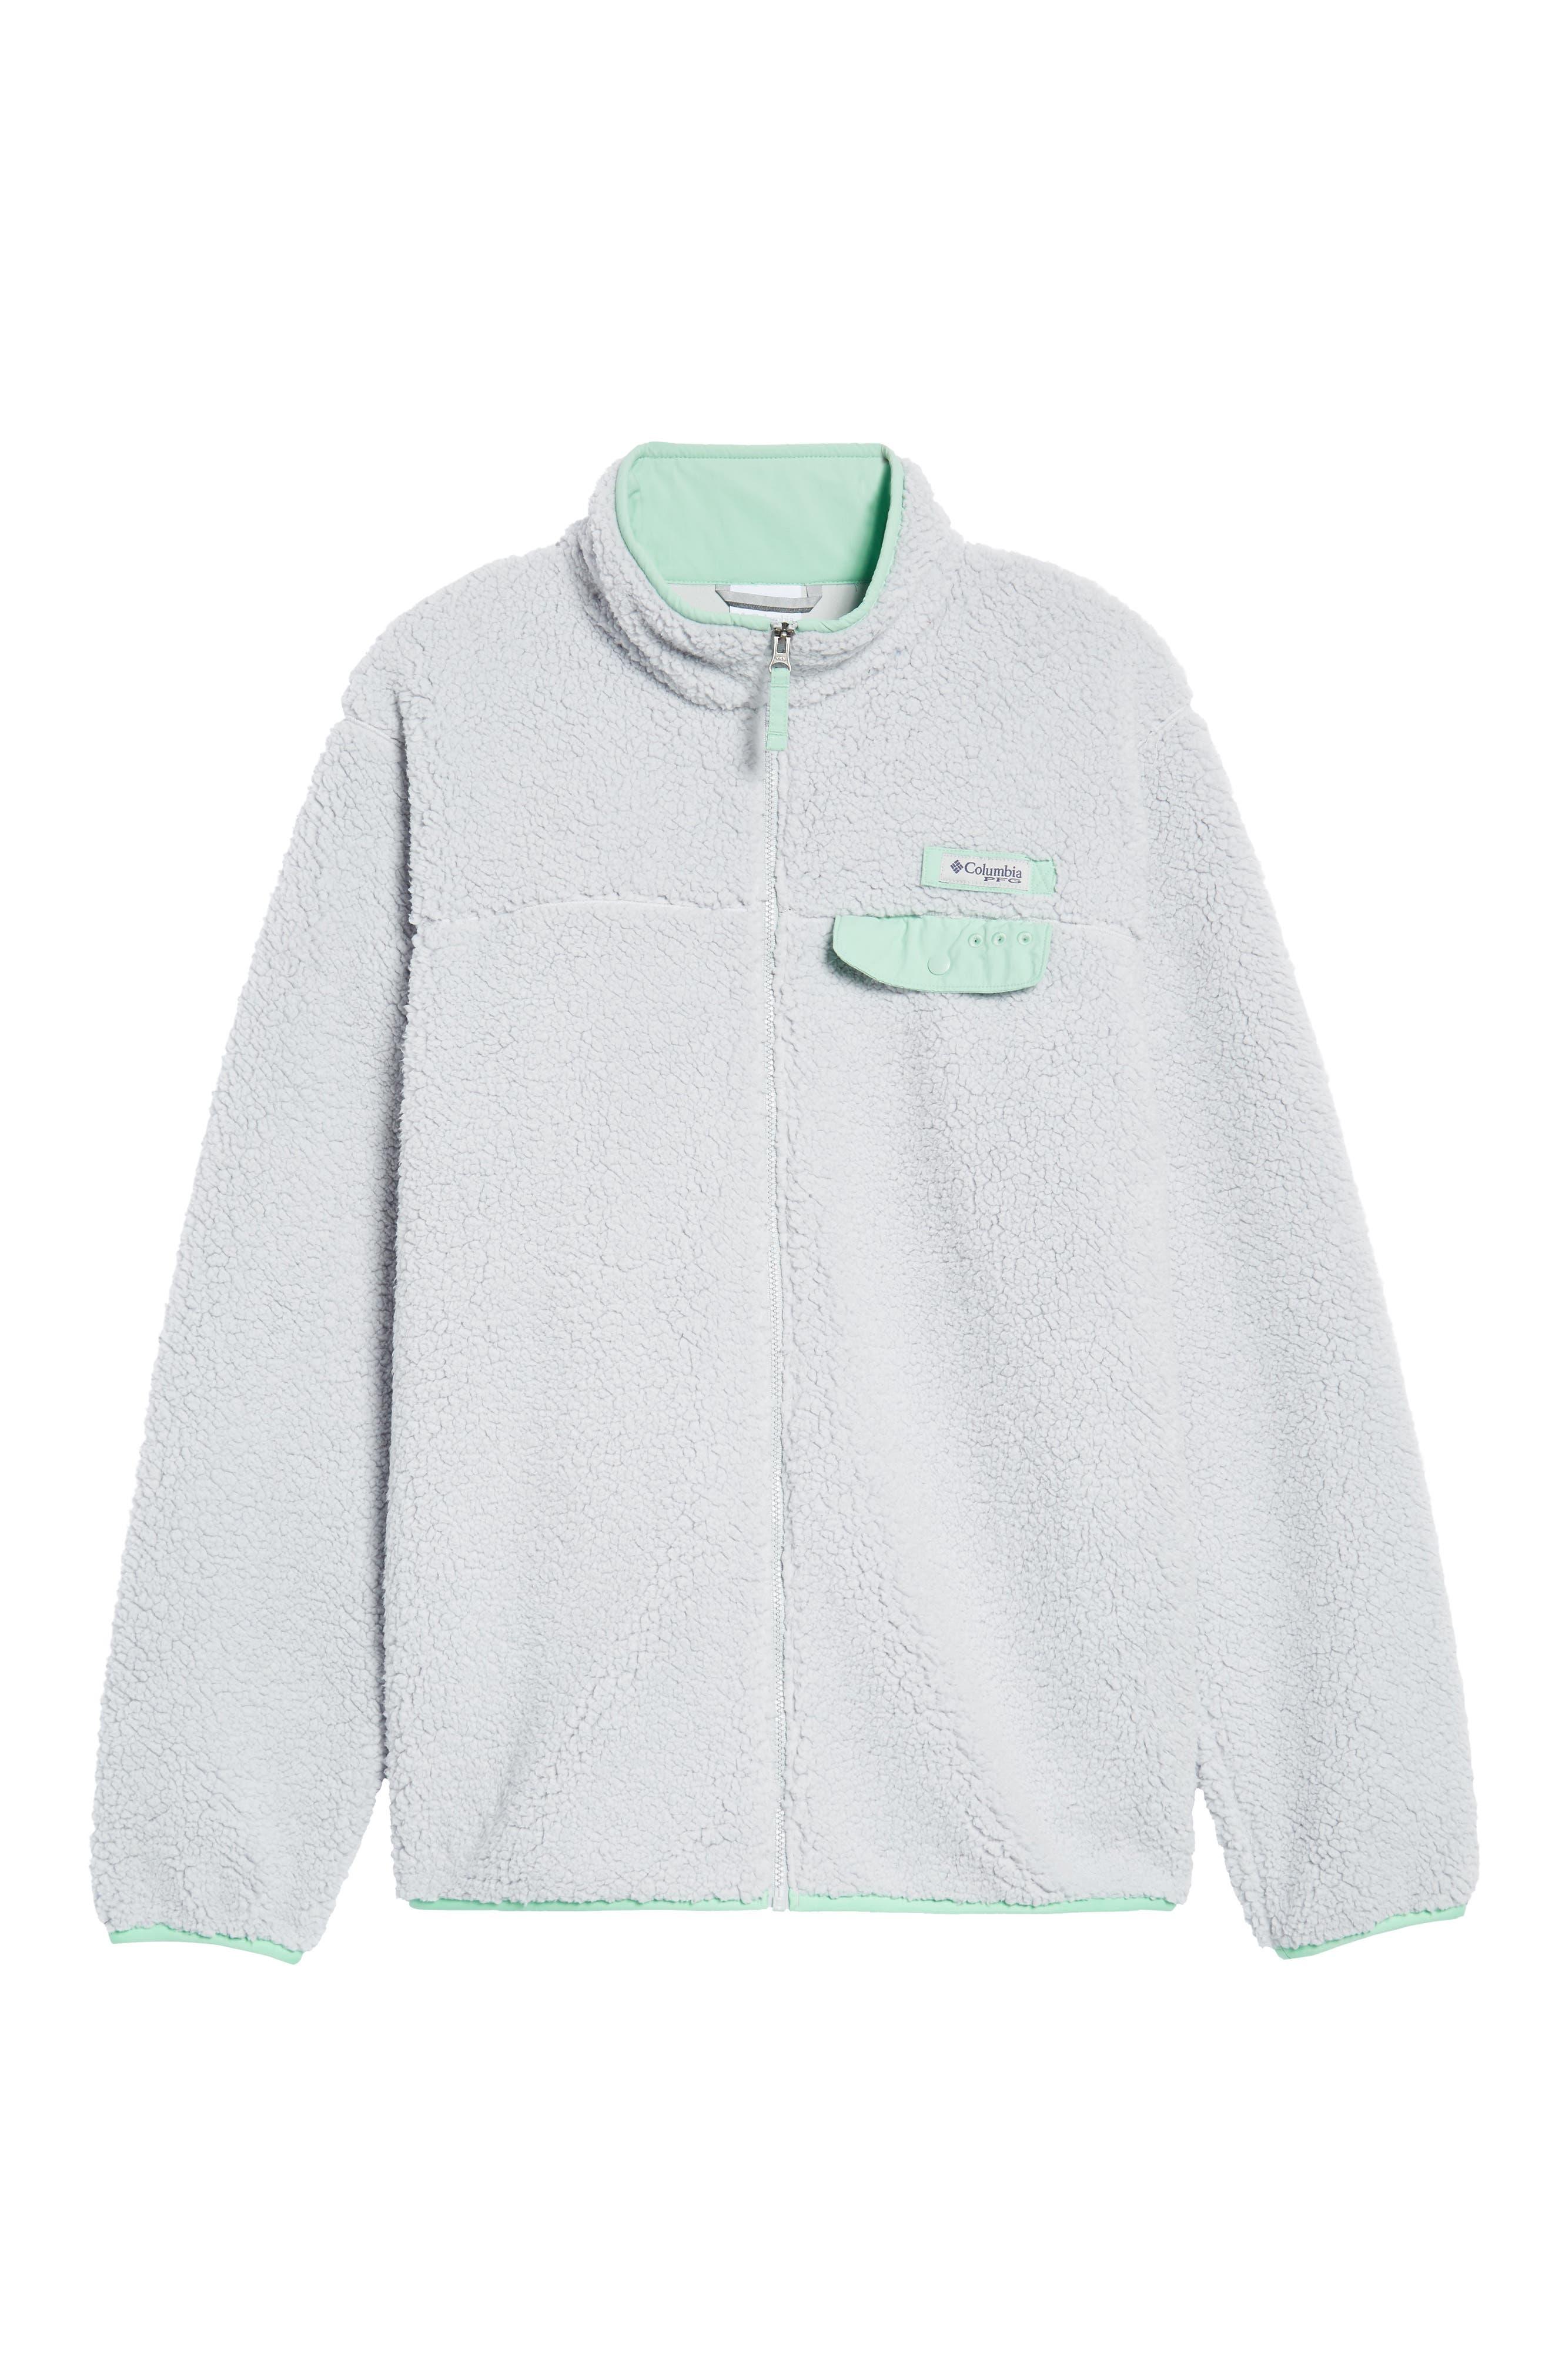 Harborside Fleece Jacket,                             Alternate thumbnail 22, color,